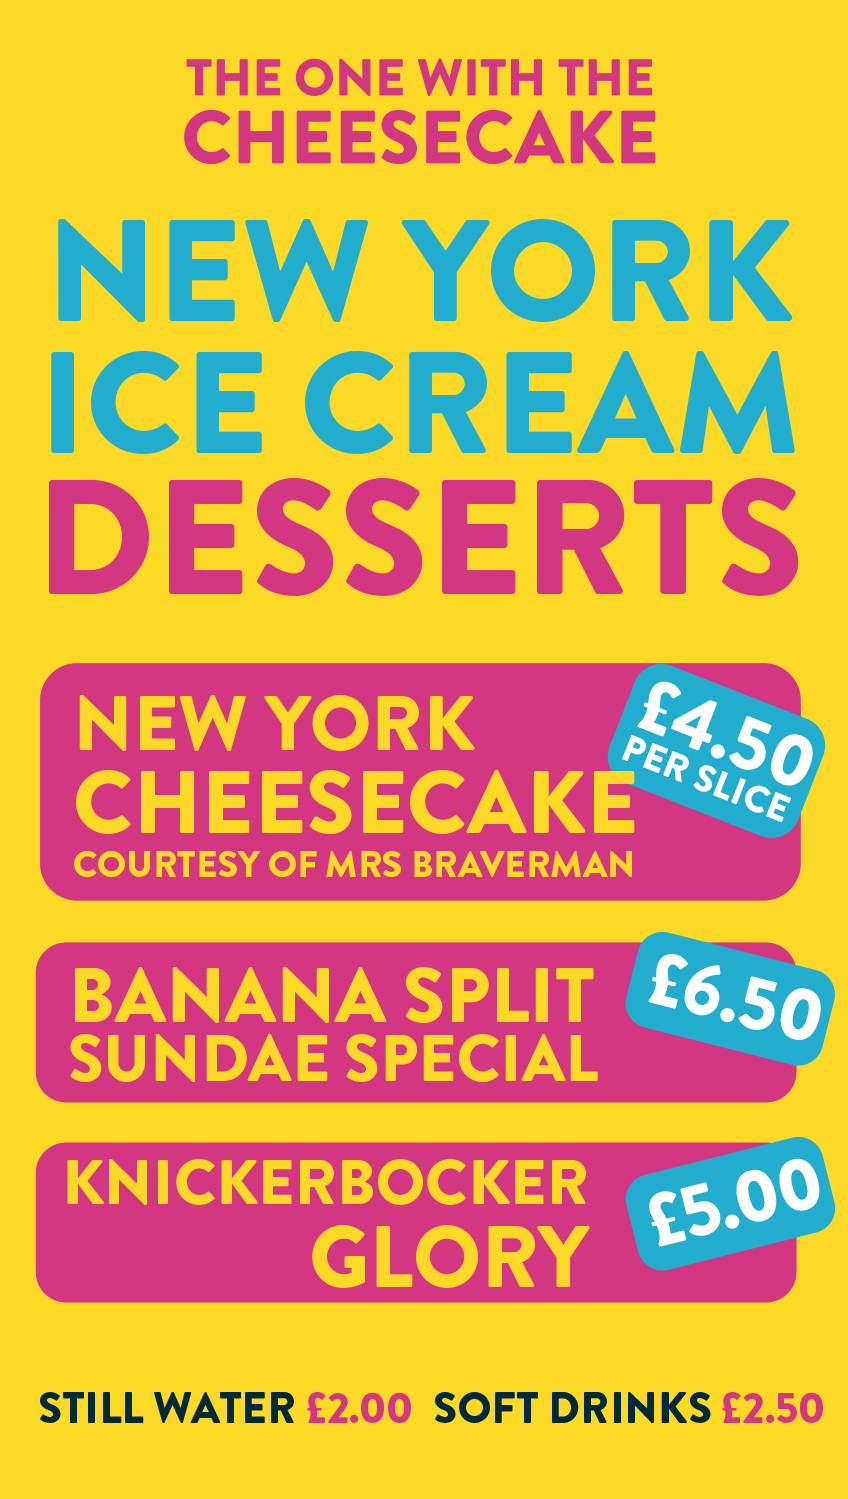 F&B_Cheesecake + Ice creame menu 1.jpg